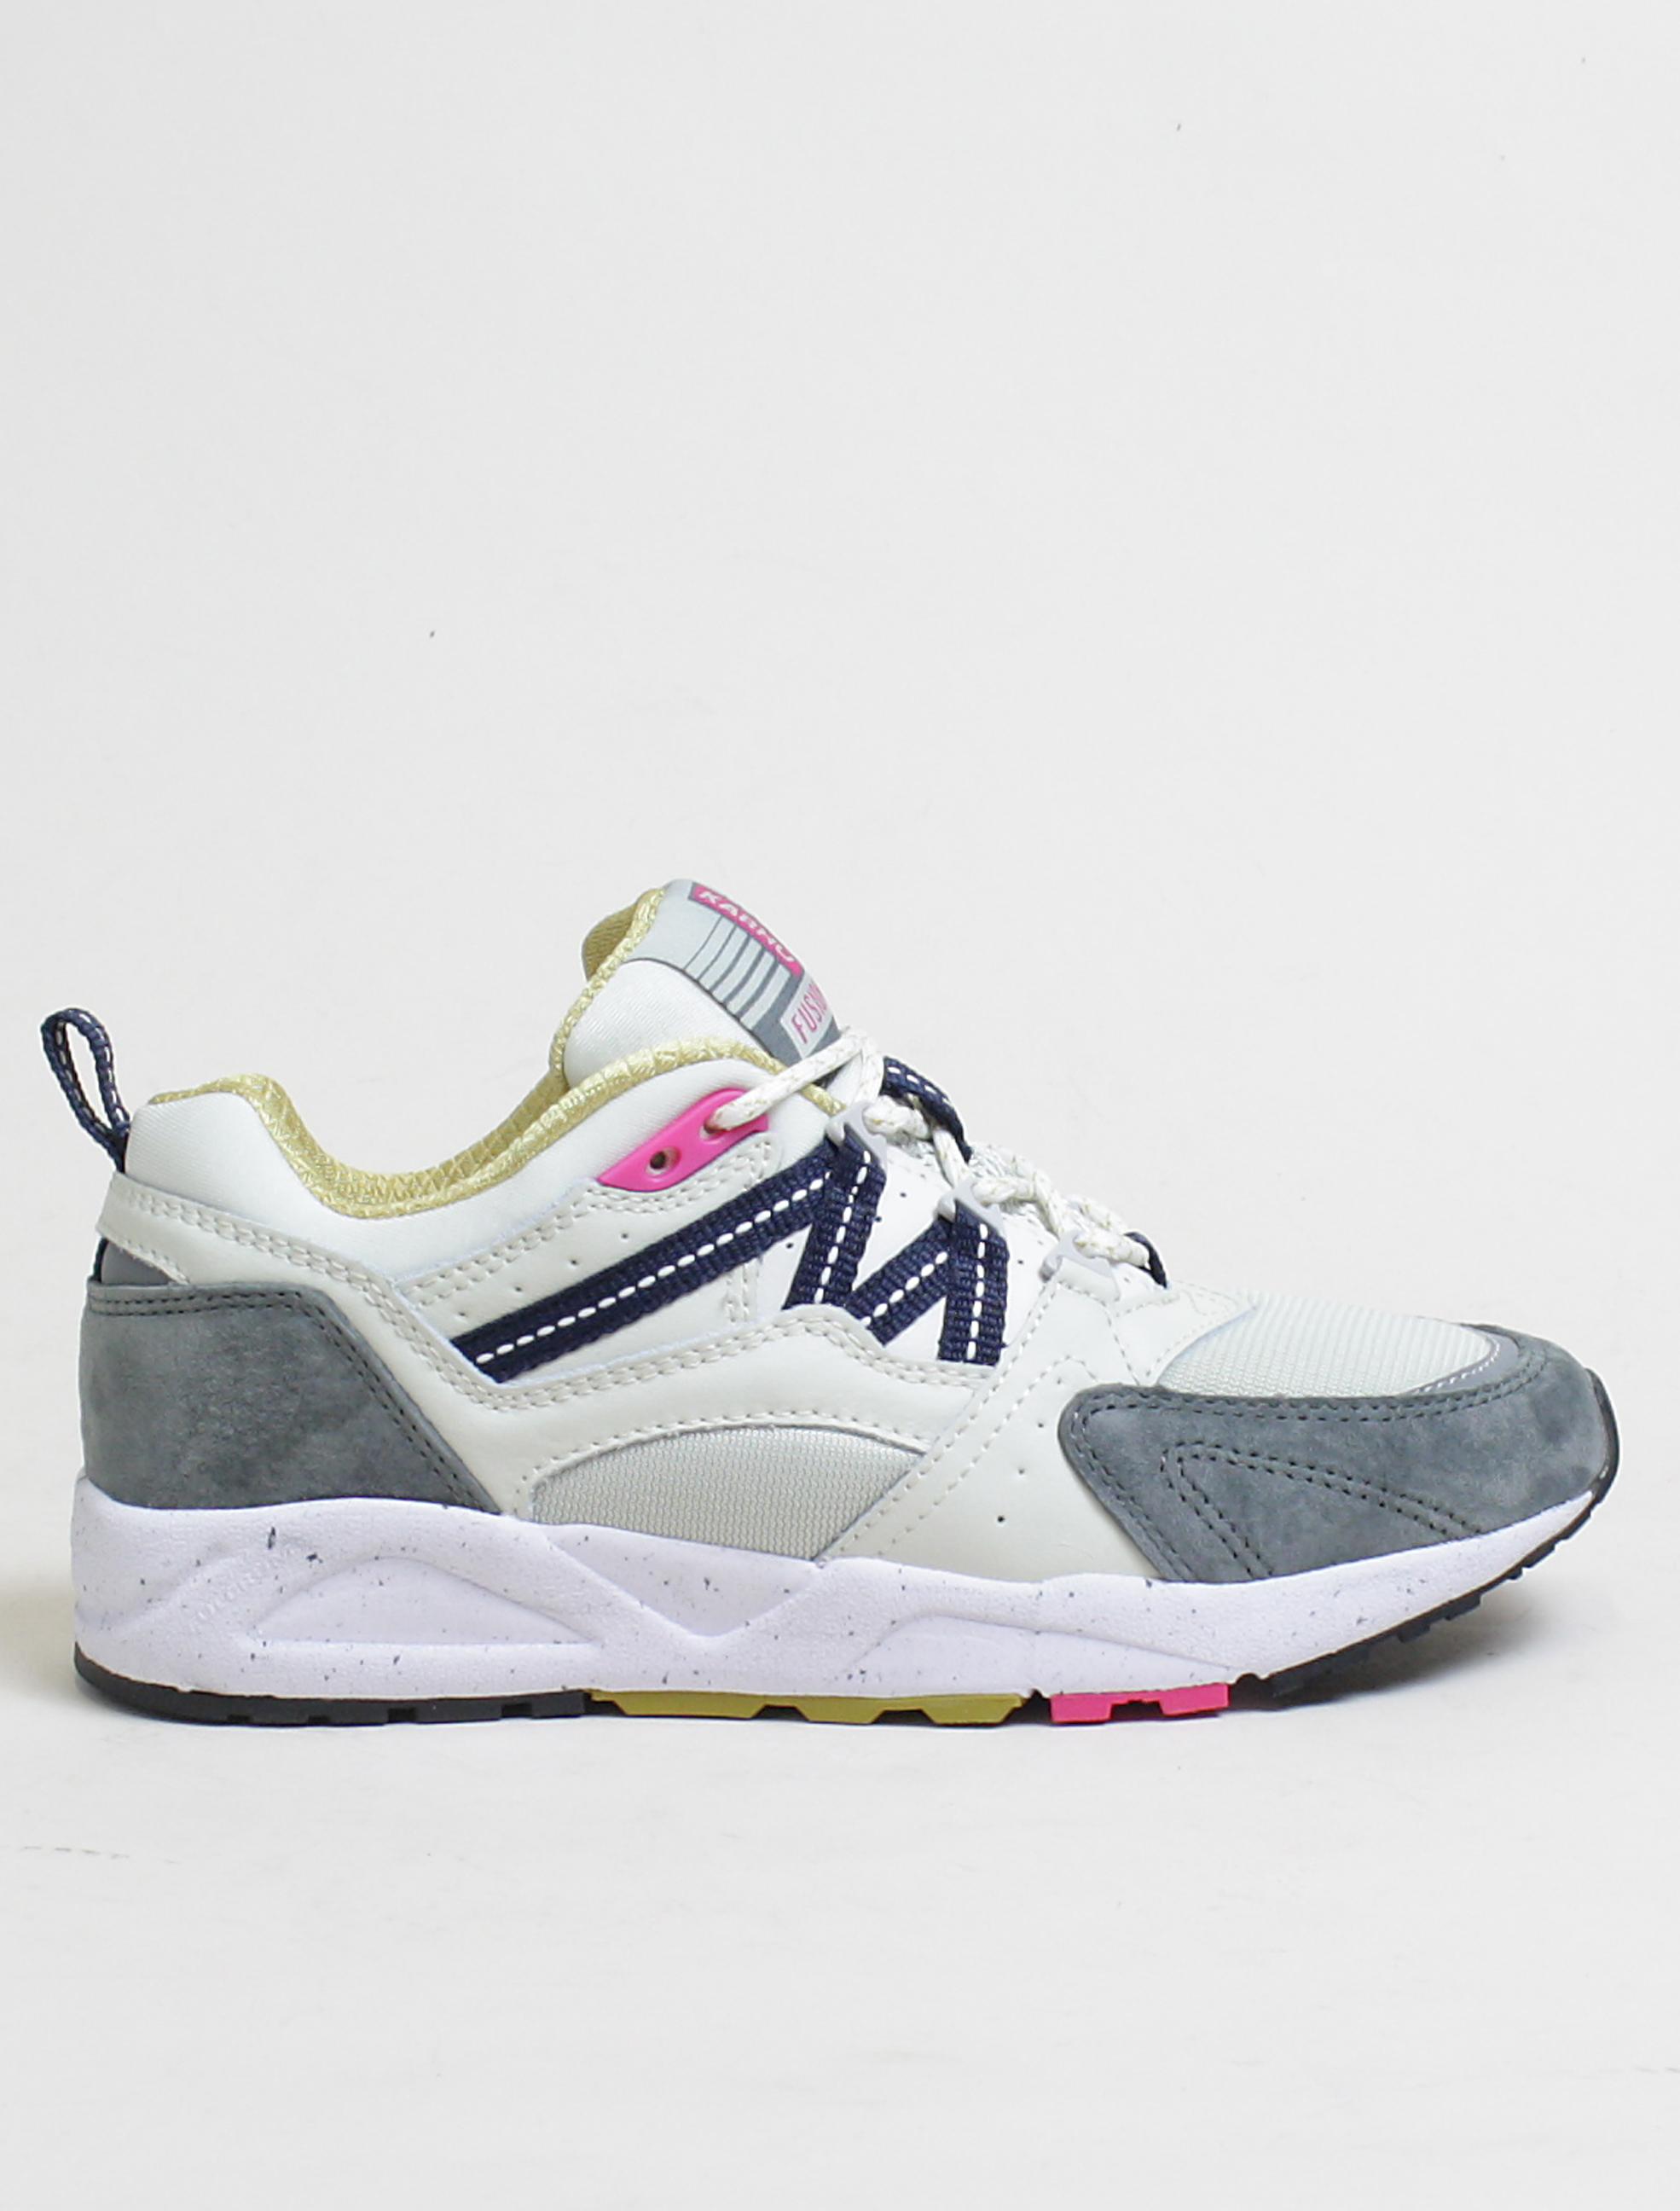 Karhu Fusion 2.0 sneakers silver birch castor grey